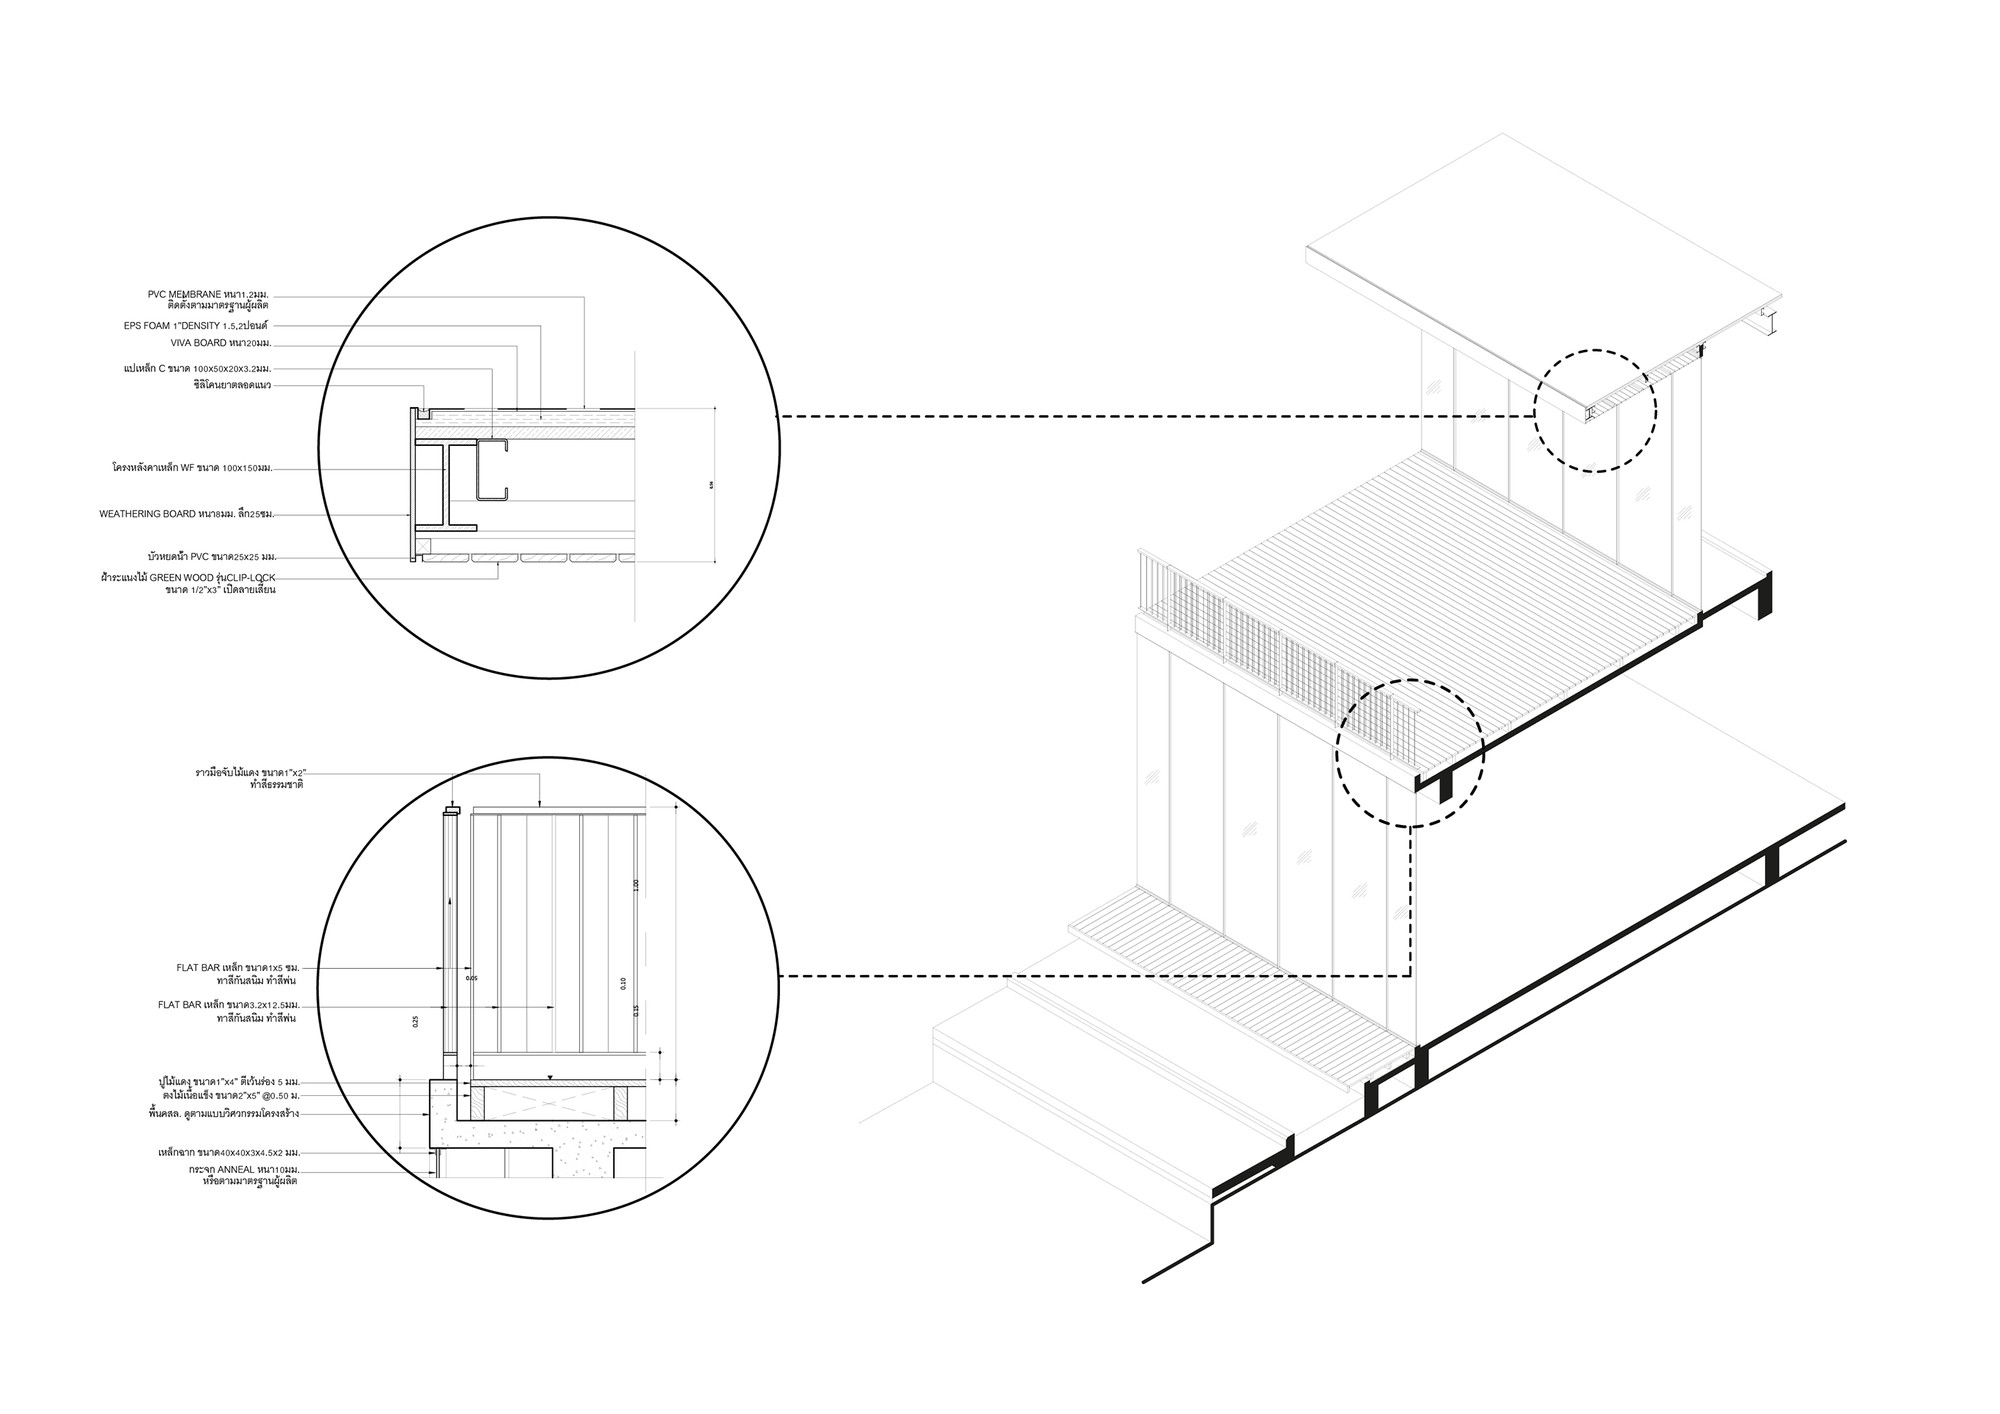 gallery of kurve 7 stu d o architects 21 2 X 4 Wood kurve 7 detail